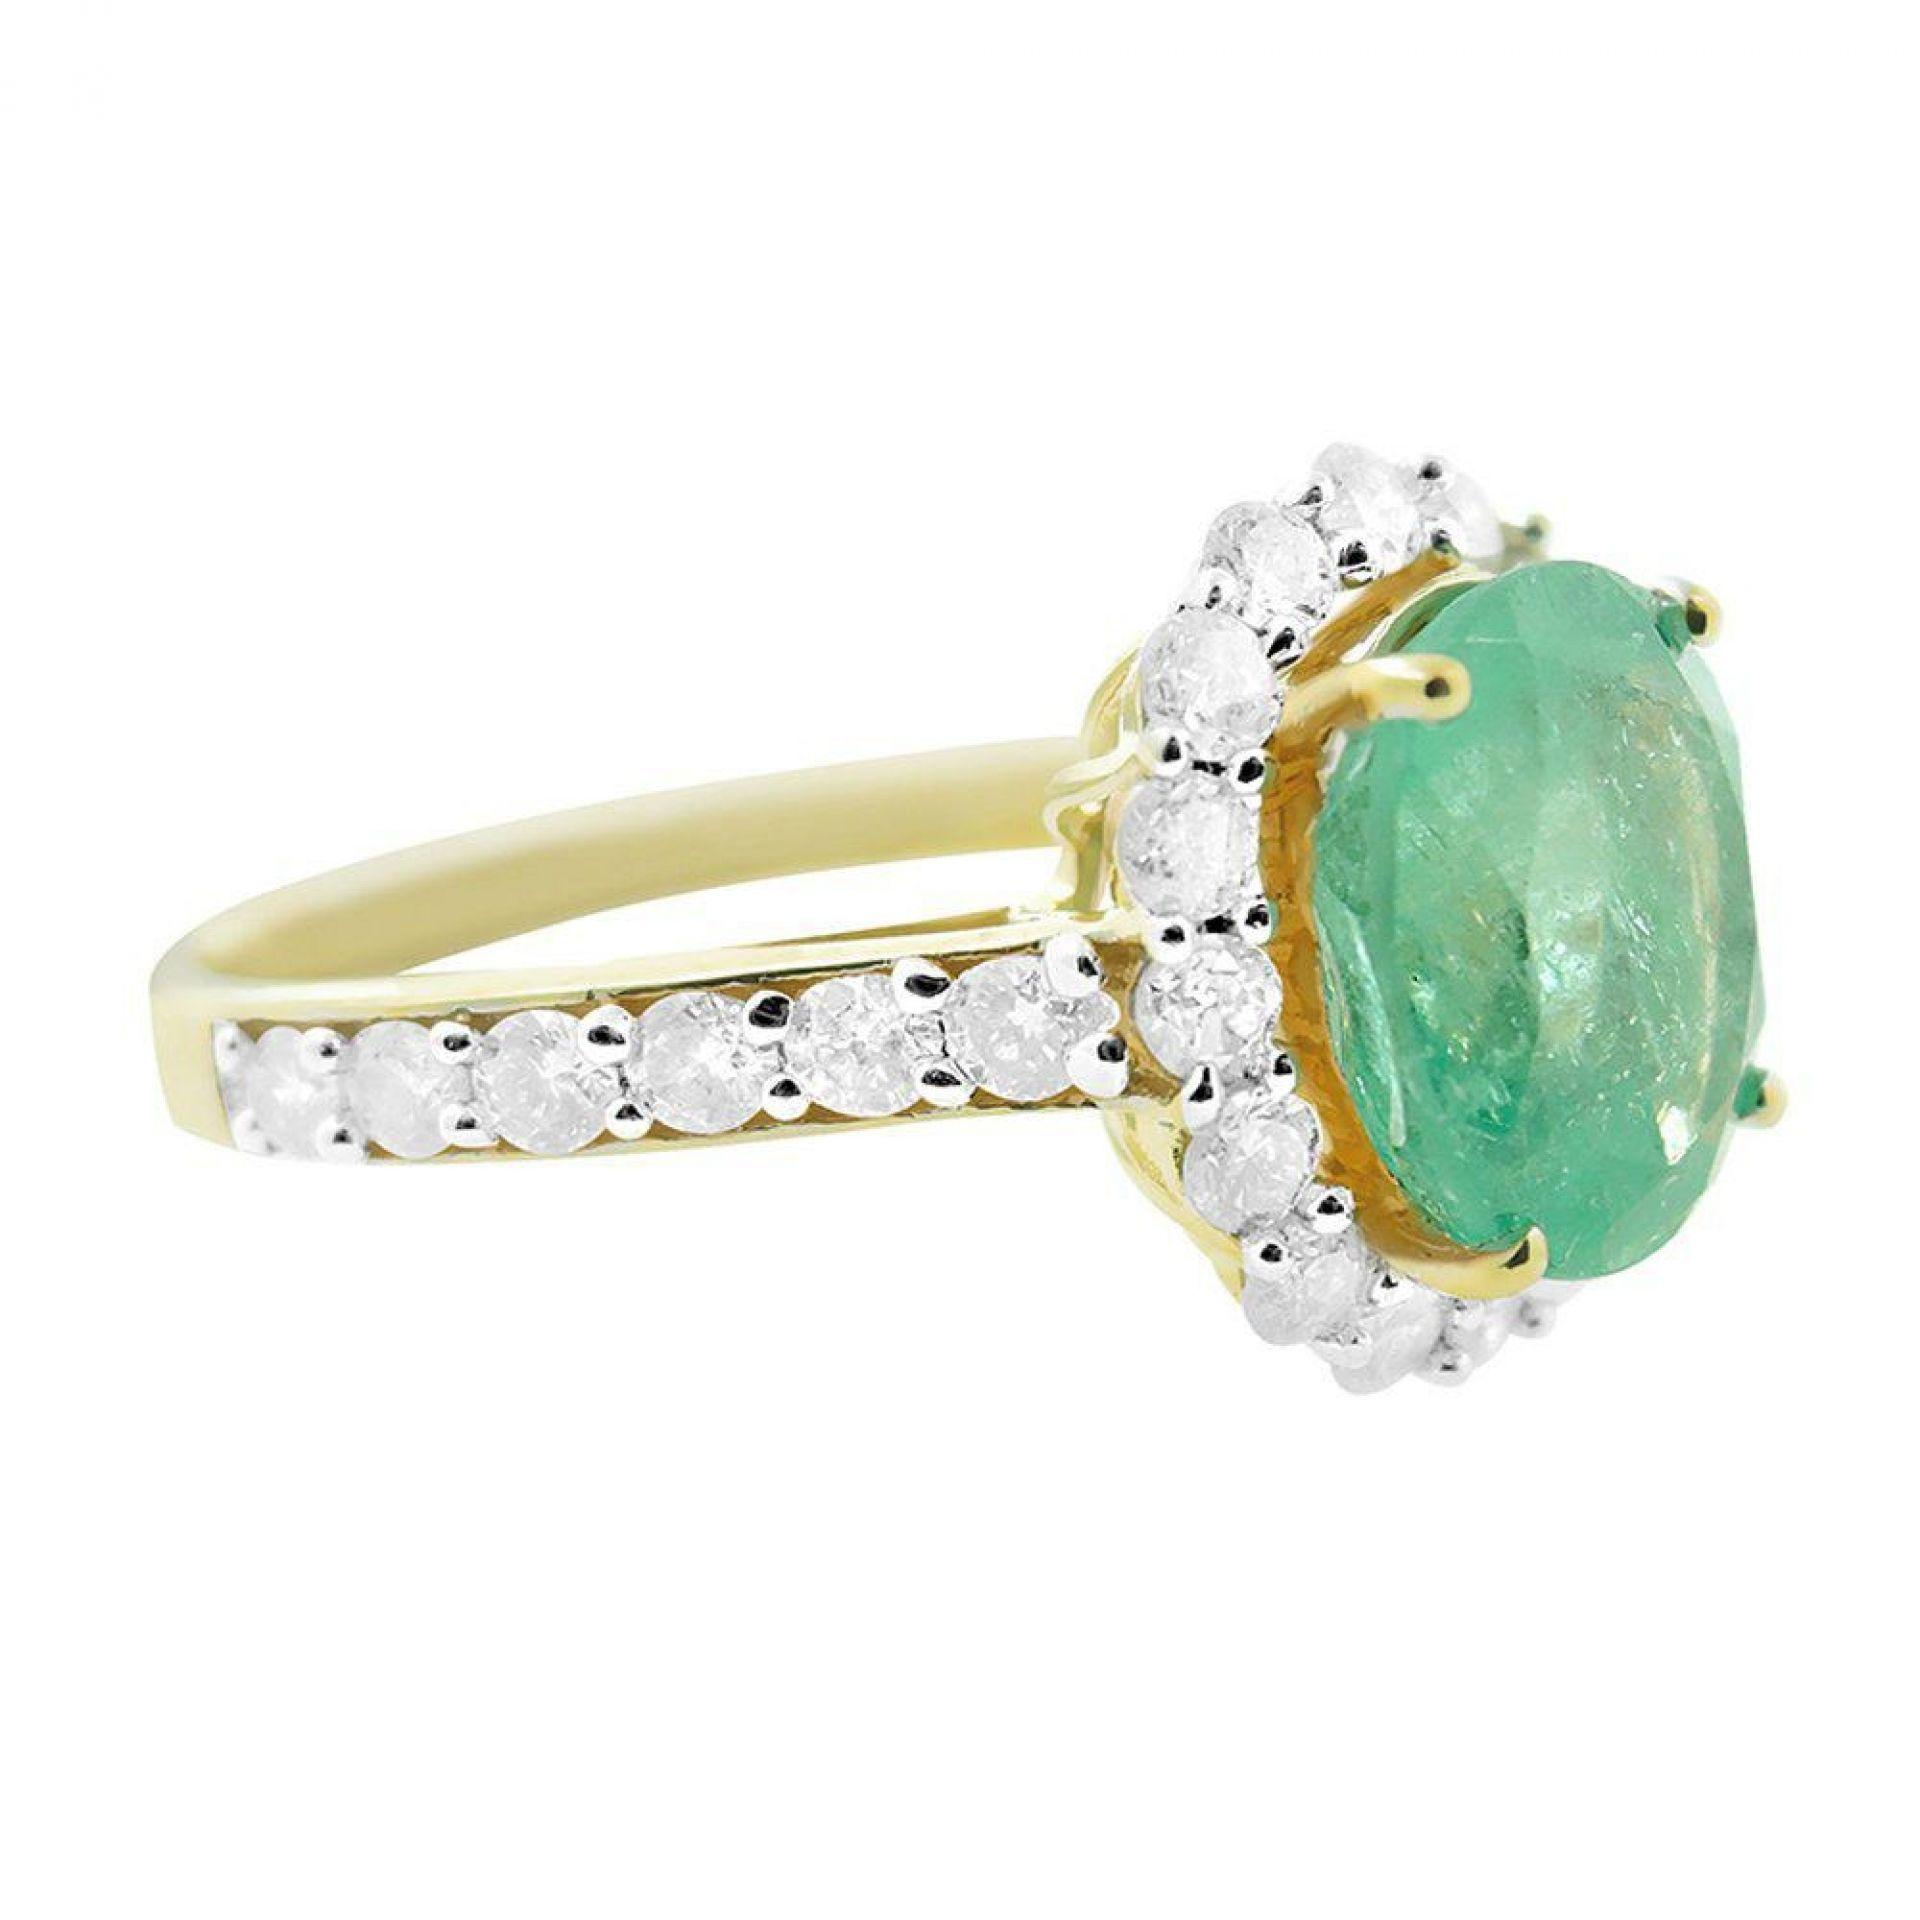 2.68ct Emerald and 0.87ctw Diamond Ring